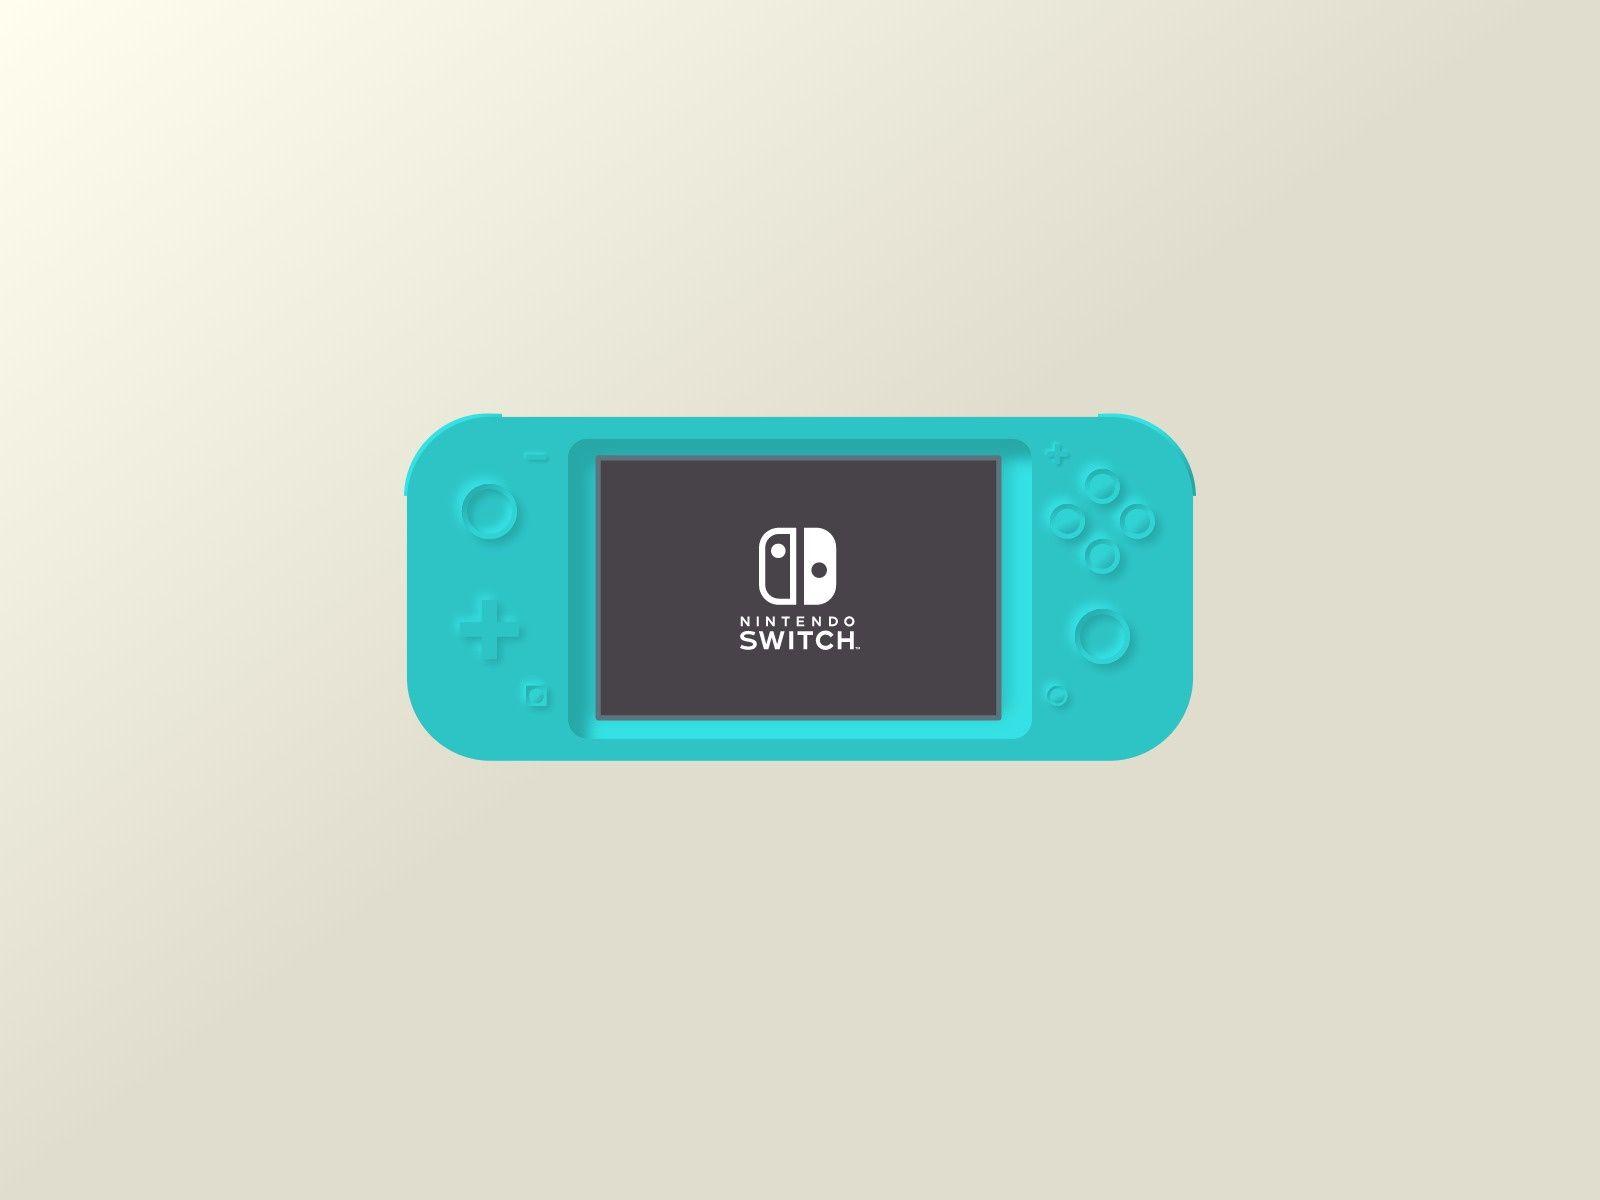 Nintendo Switch Neumorphic Design